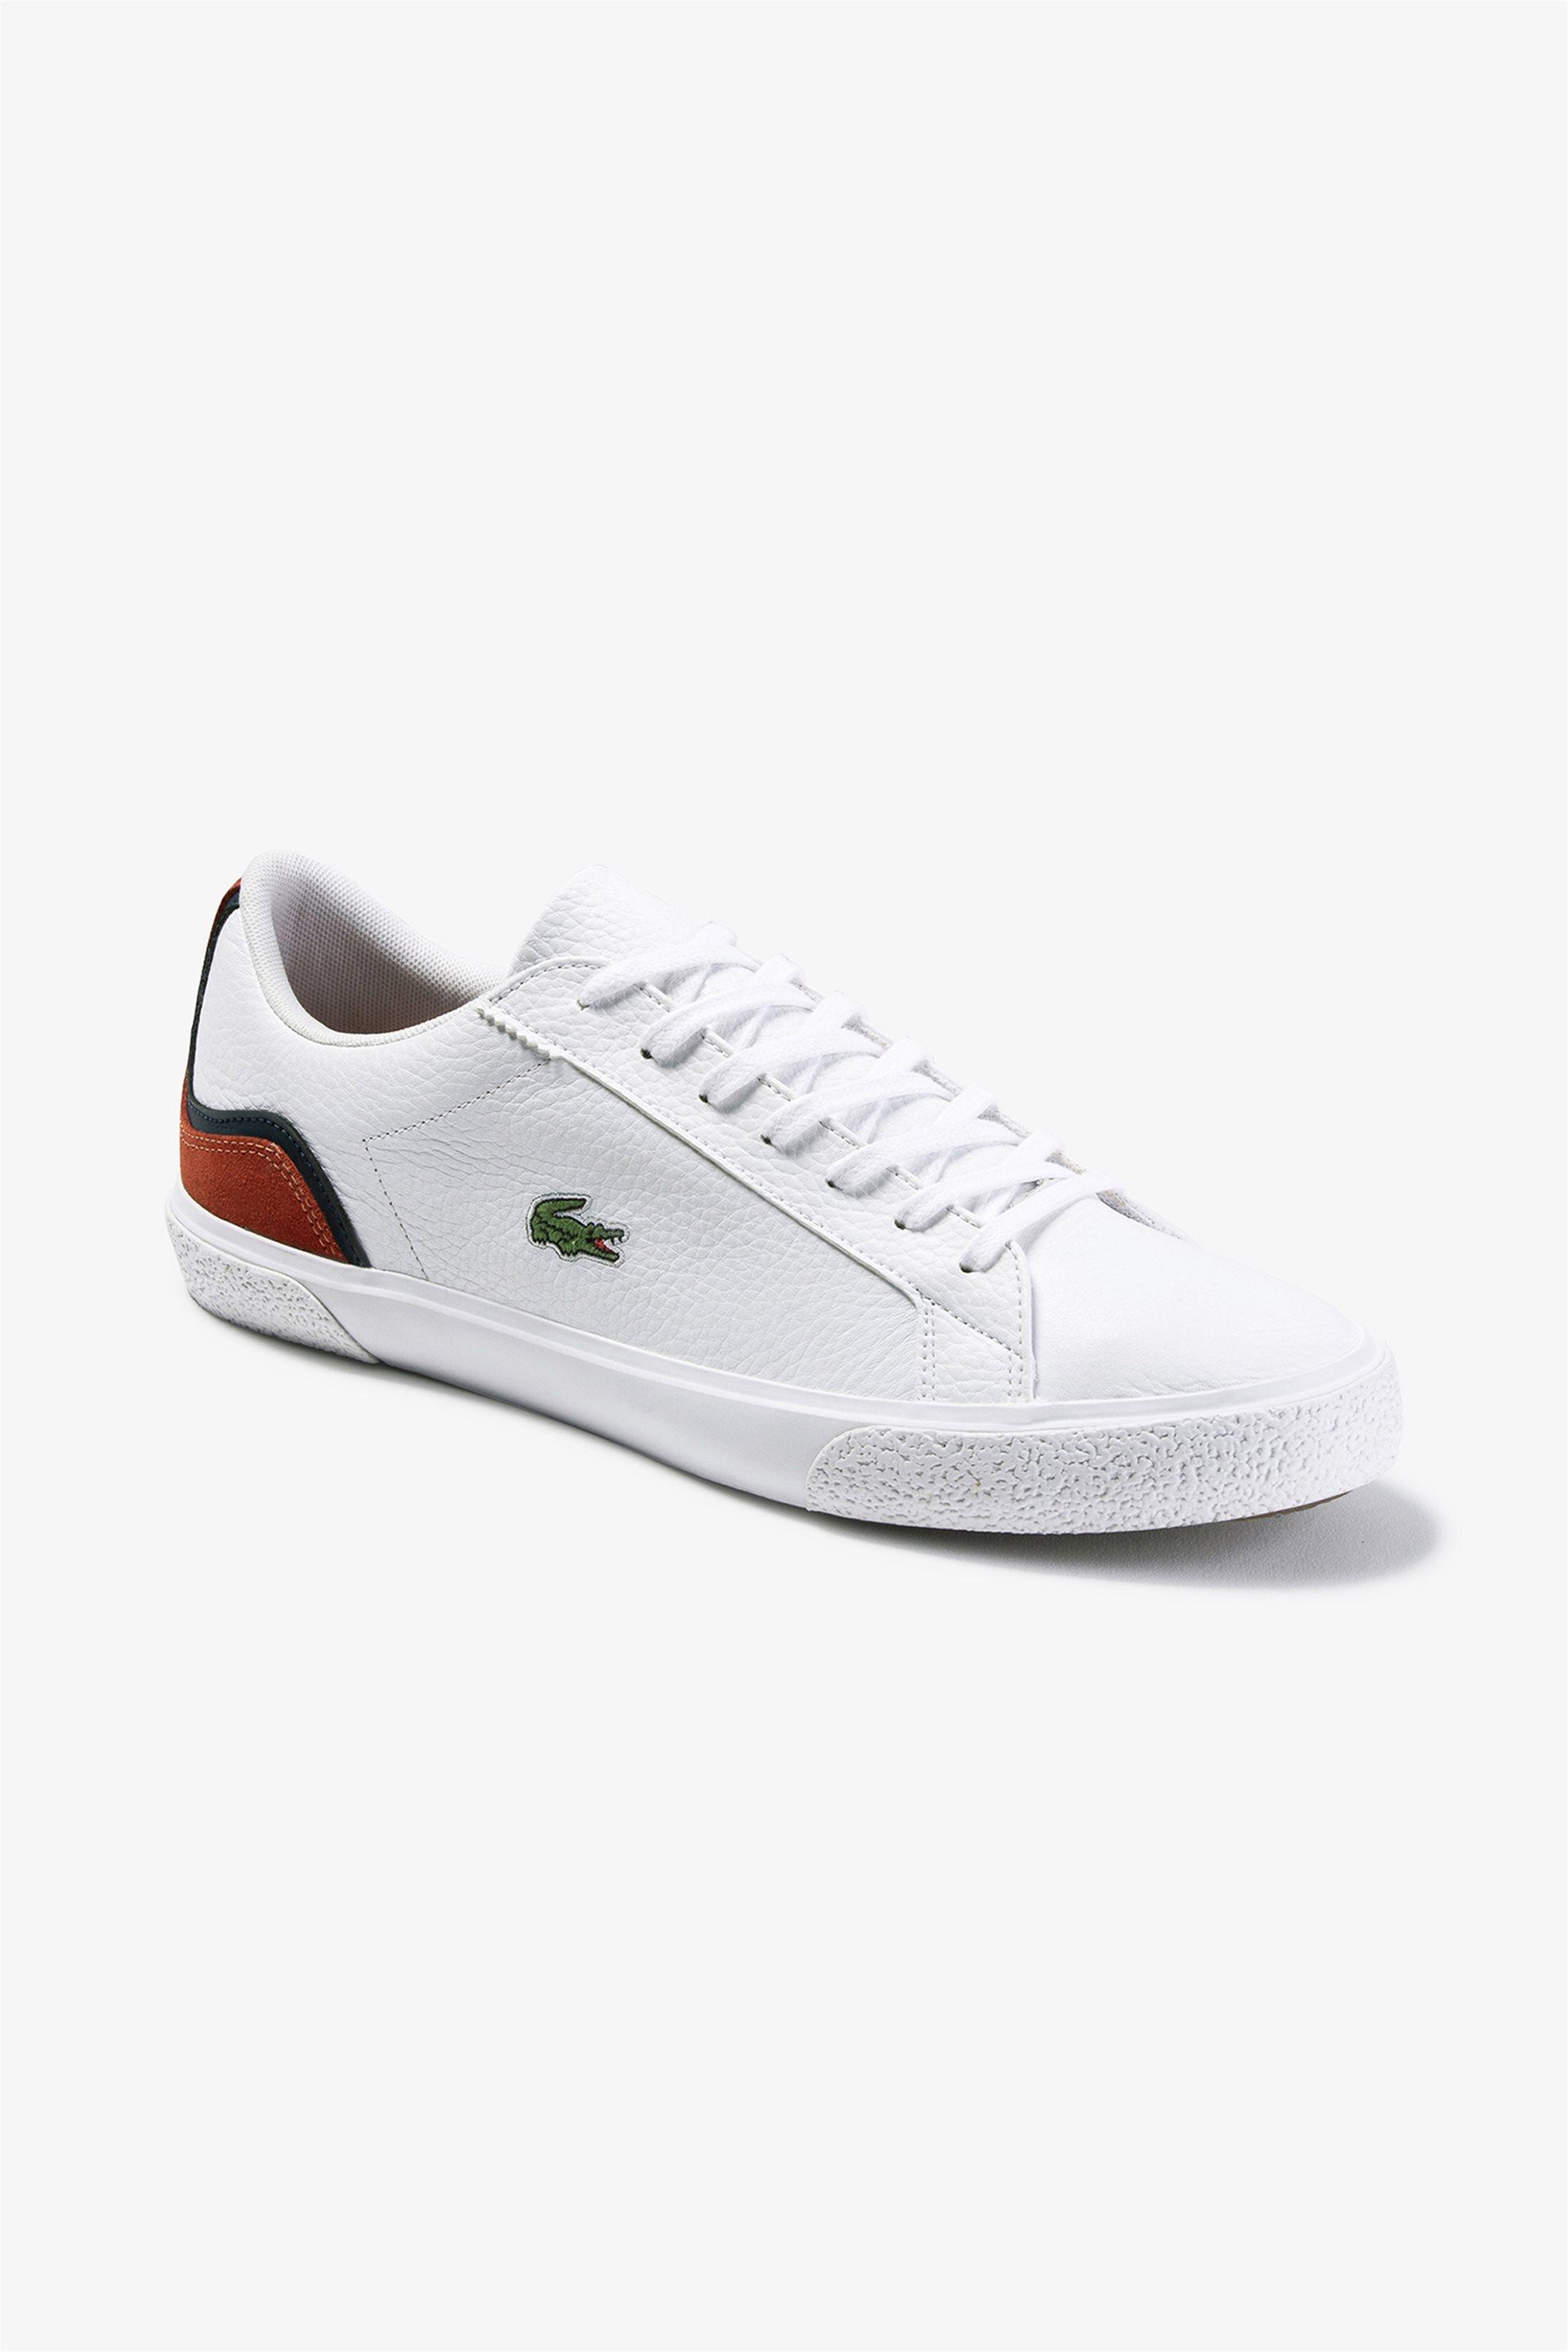 "Lacoste ανδρικά sneakers ""Lerond"" – 39CMA00641U2 – Λευκό"